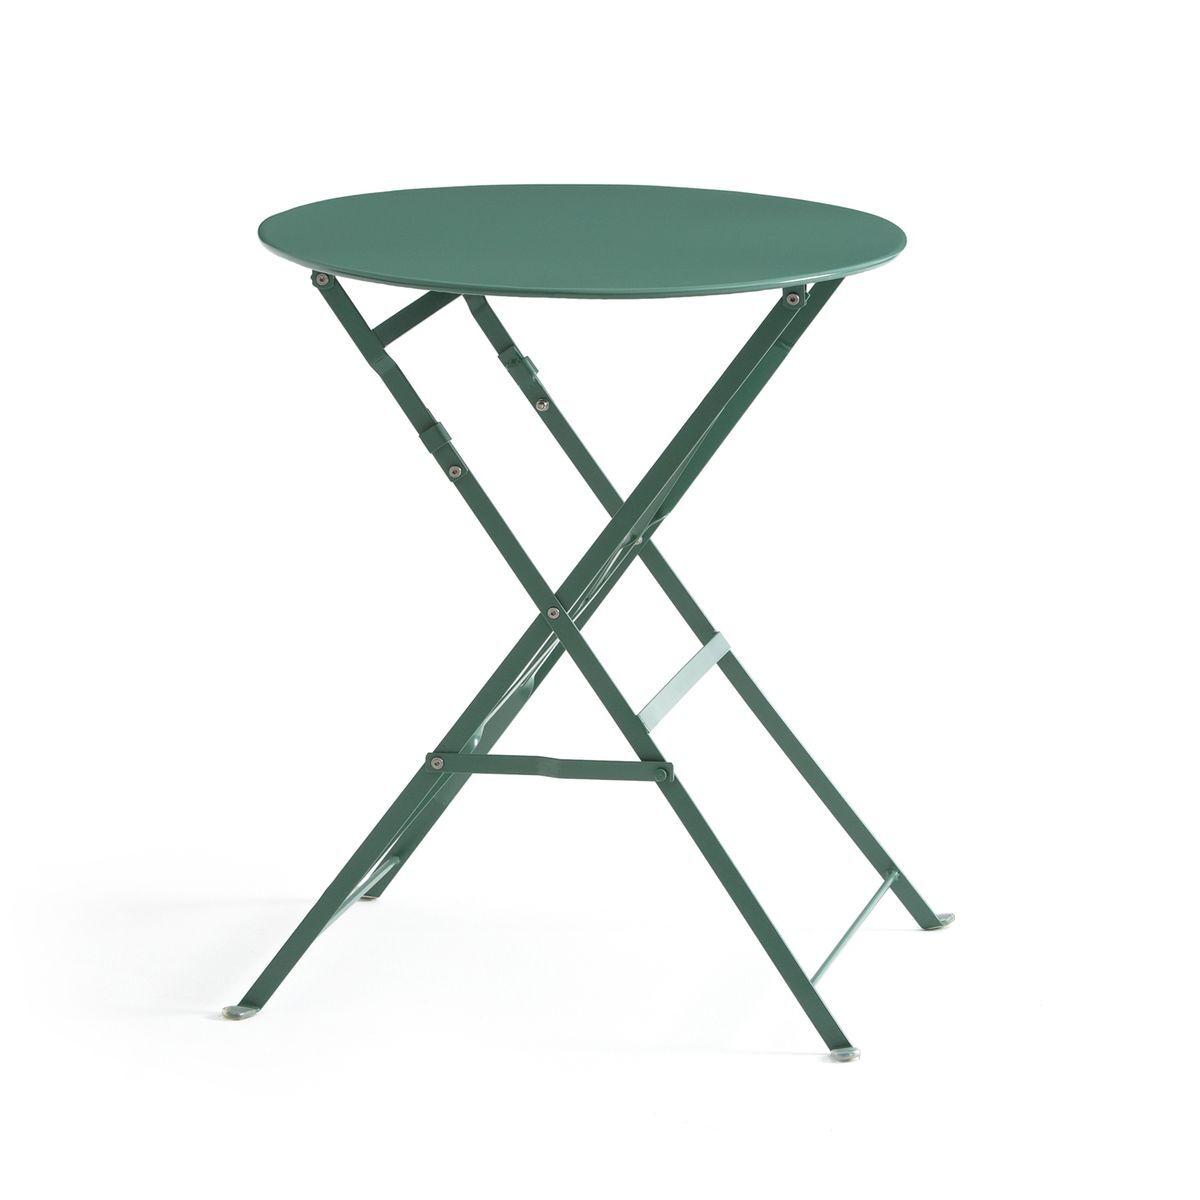 La Redoute Guéridon, table pliante en métal OZEVAN - LA REDOUTE INTERIEURS